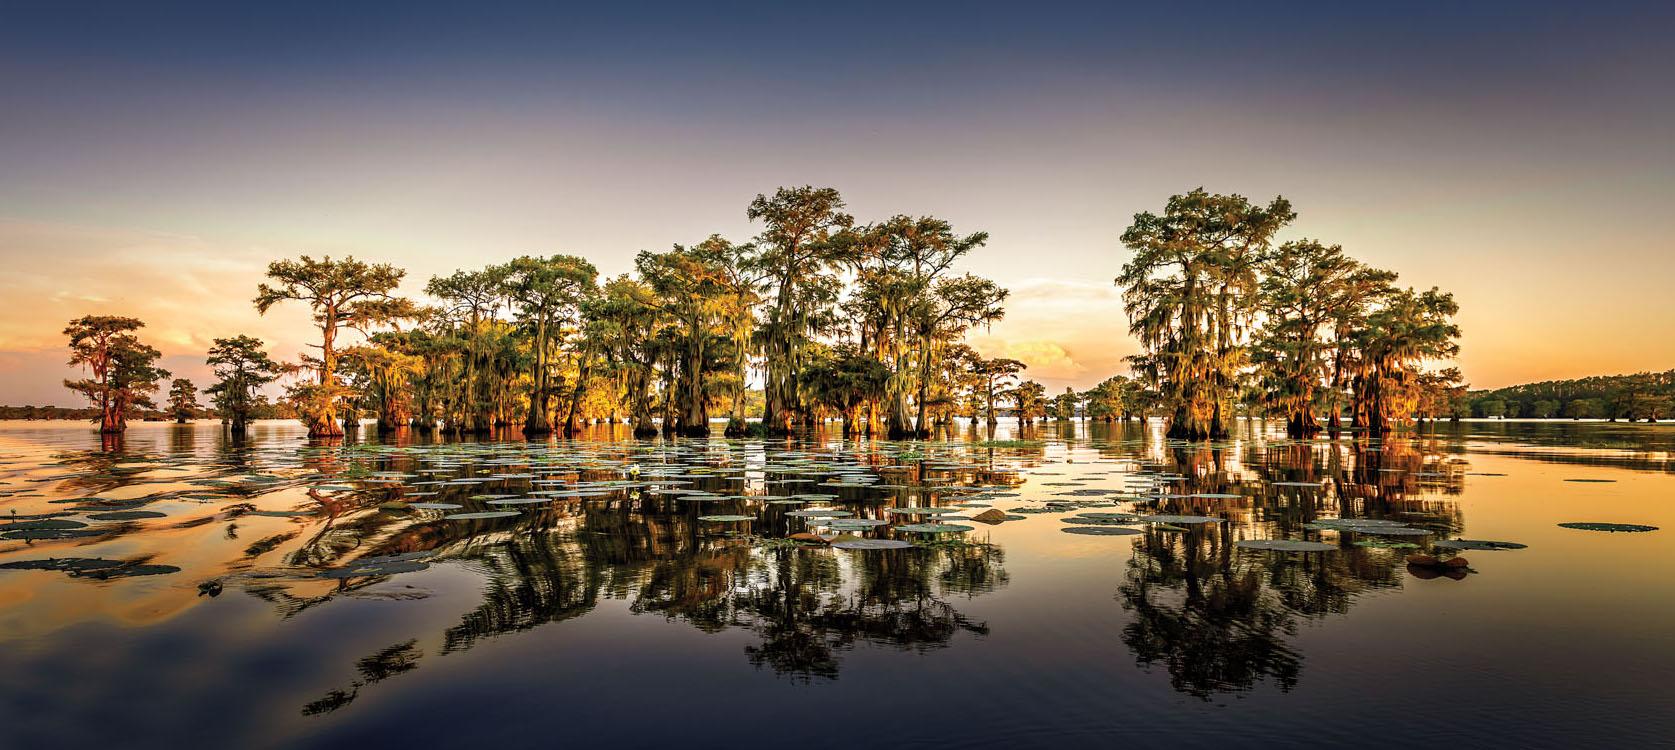 Caddo Lake State Park, Texas